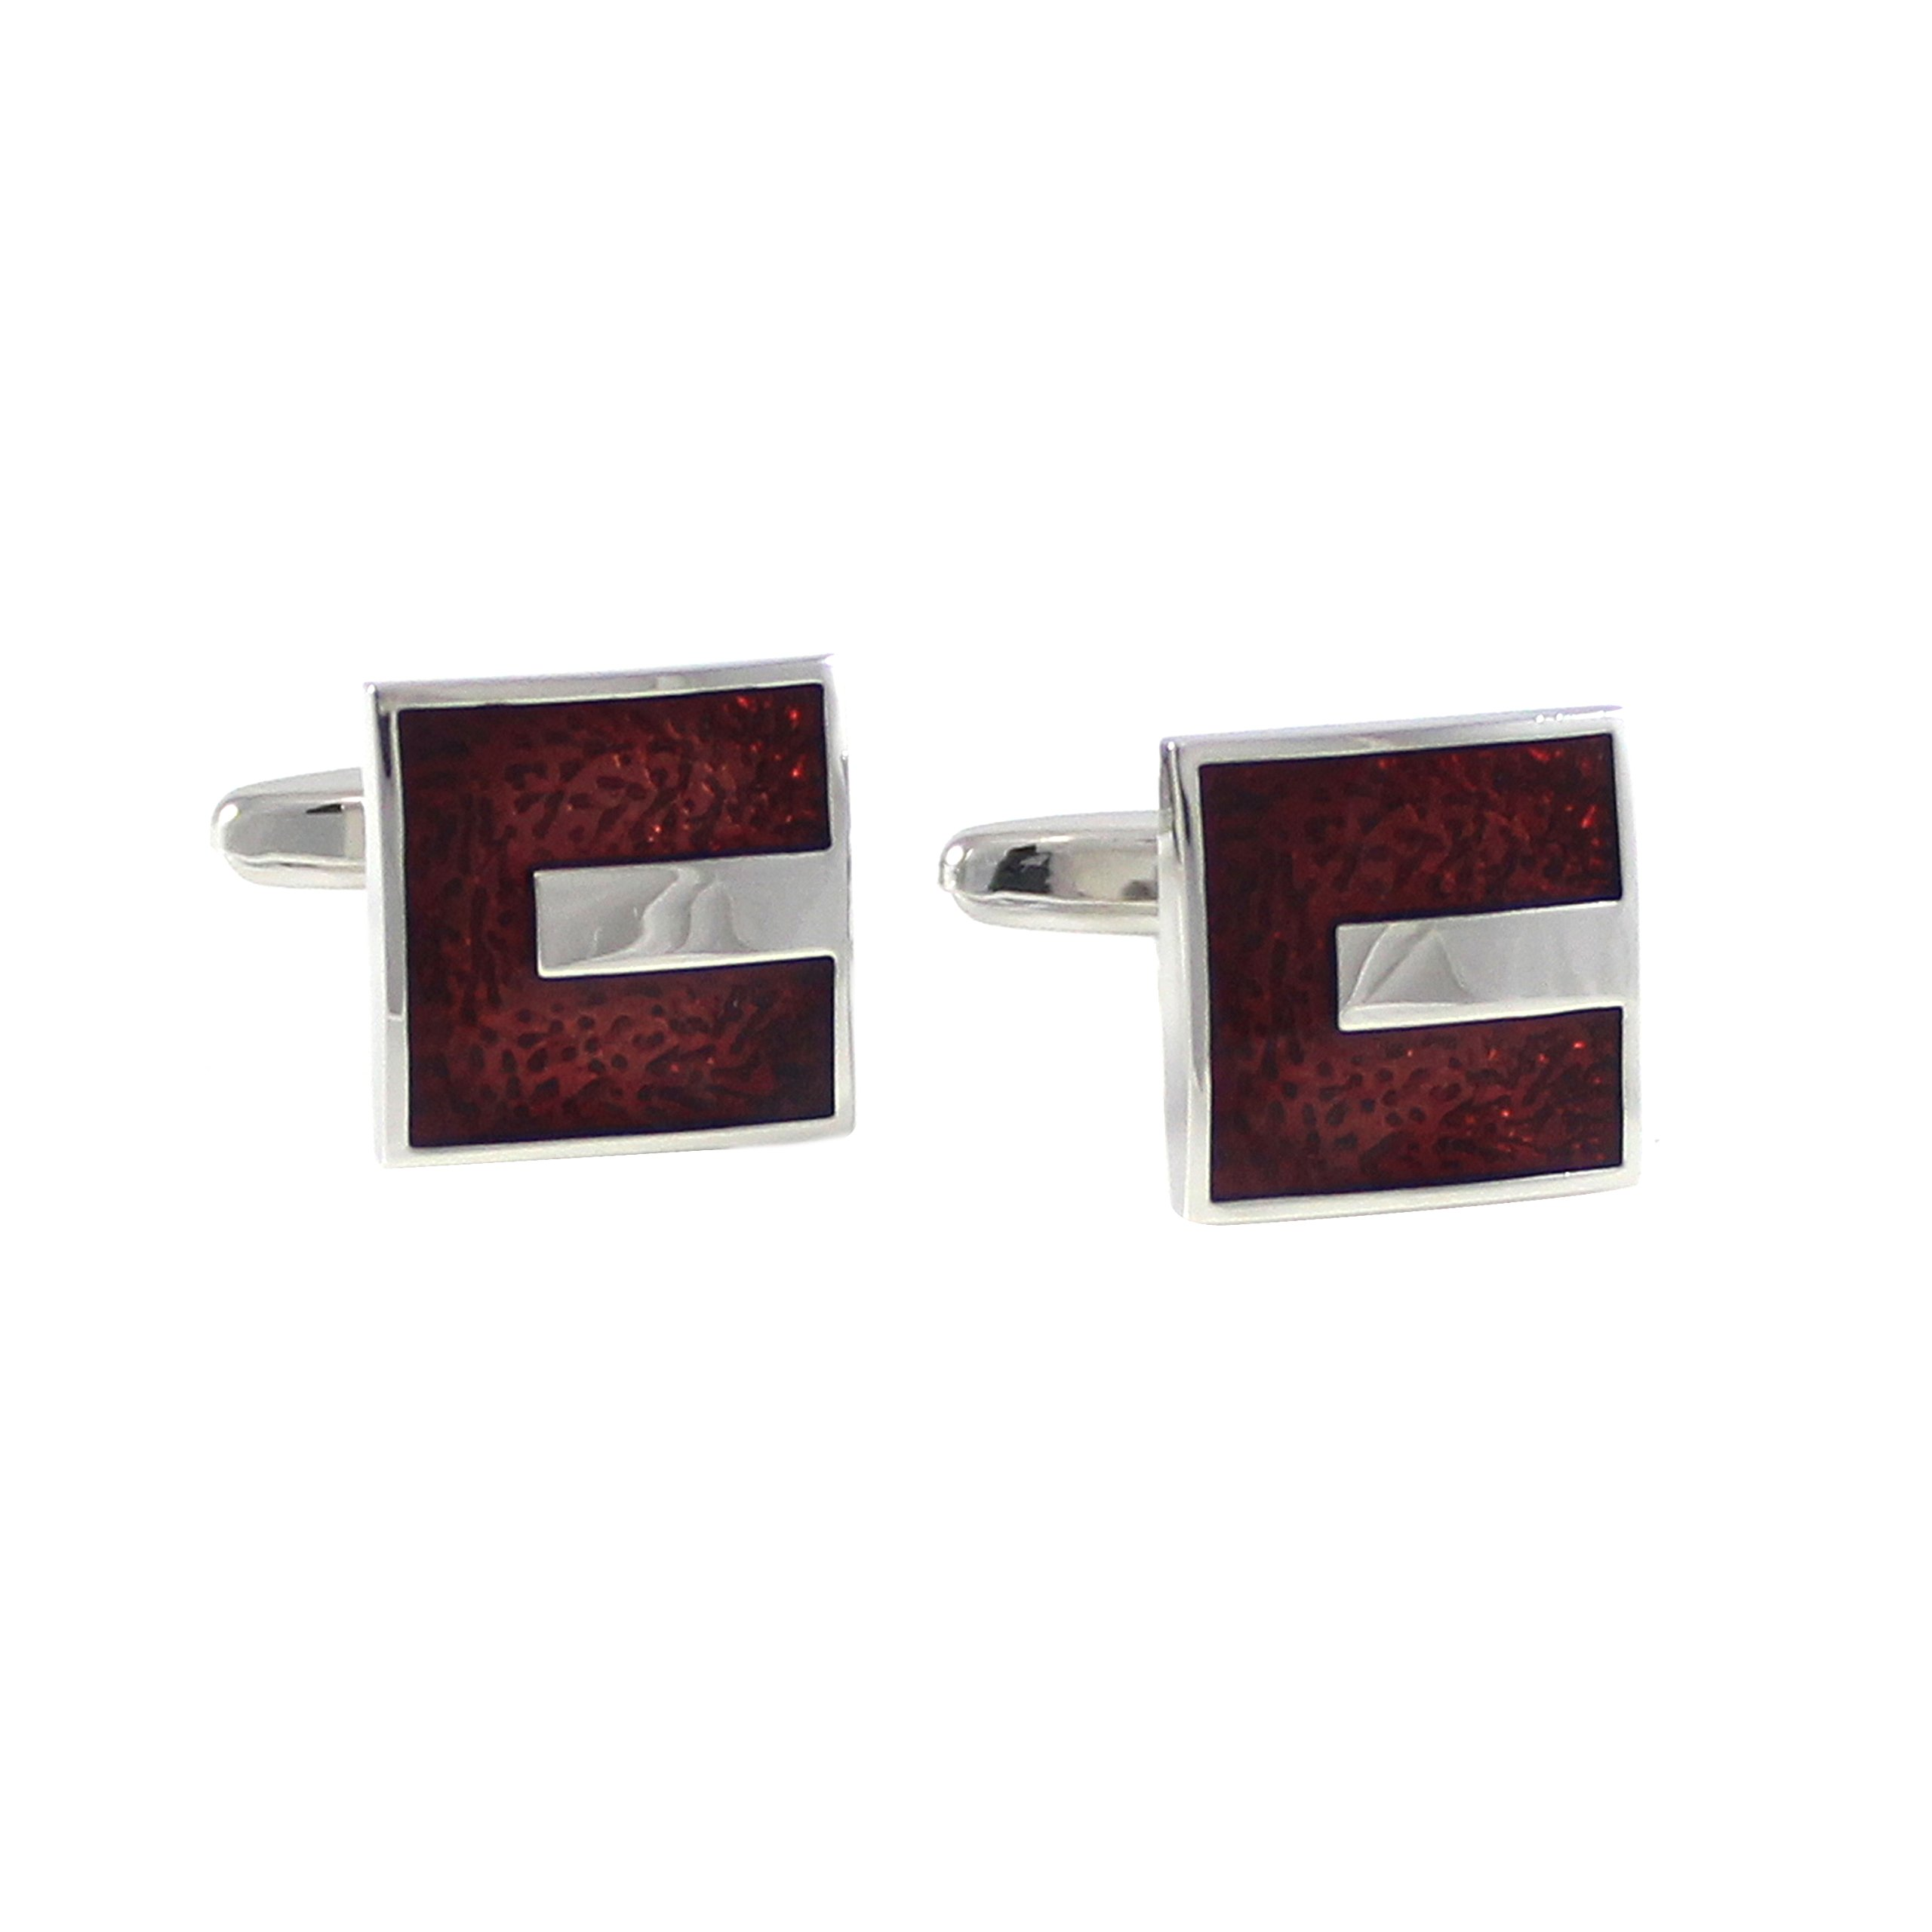 MENDEPOT Rhodium Plated Classic Transparent Burgundy Epoxy Cufflinks With Gift Box